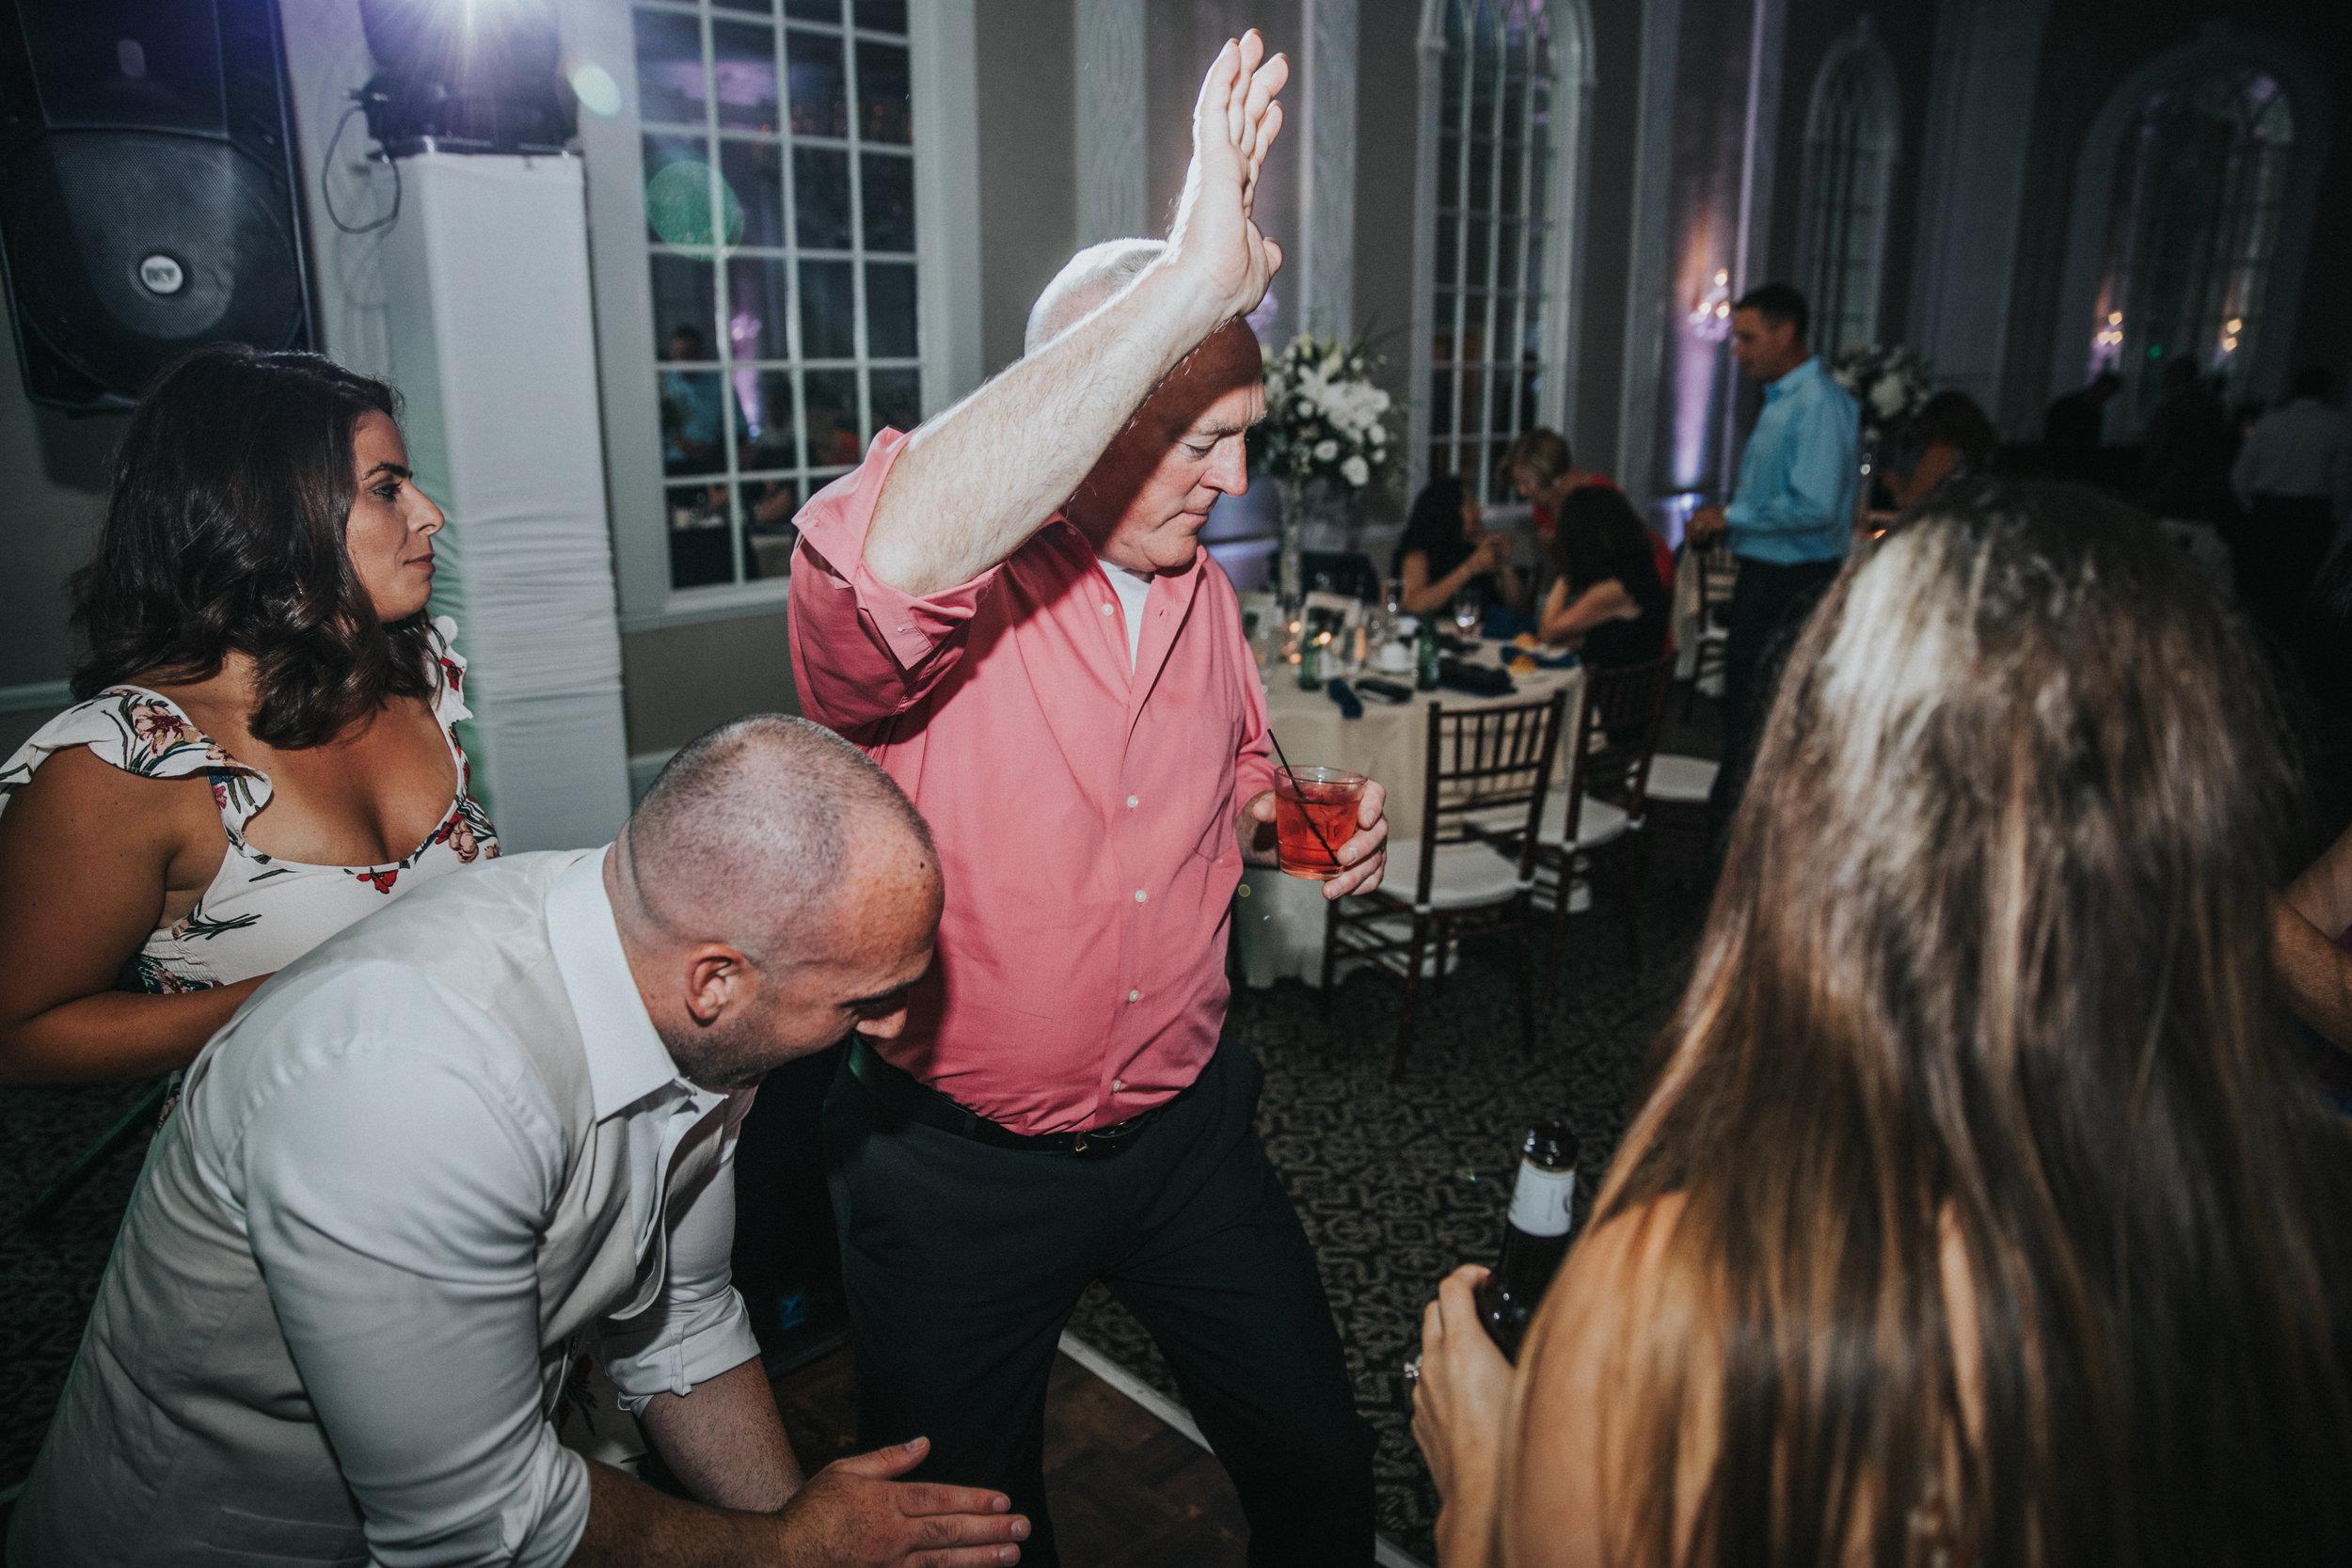 JennaLynnPhotography-NJWeddingPhotographer-Wedding-TheBerkeley-AsburyPark-Allison&Michael-Reception-136.jpg